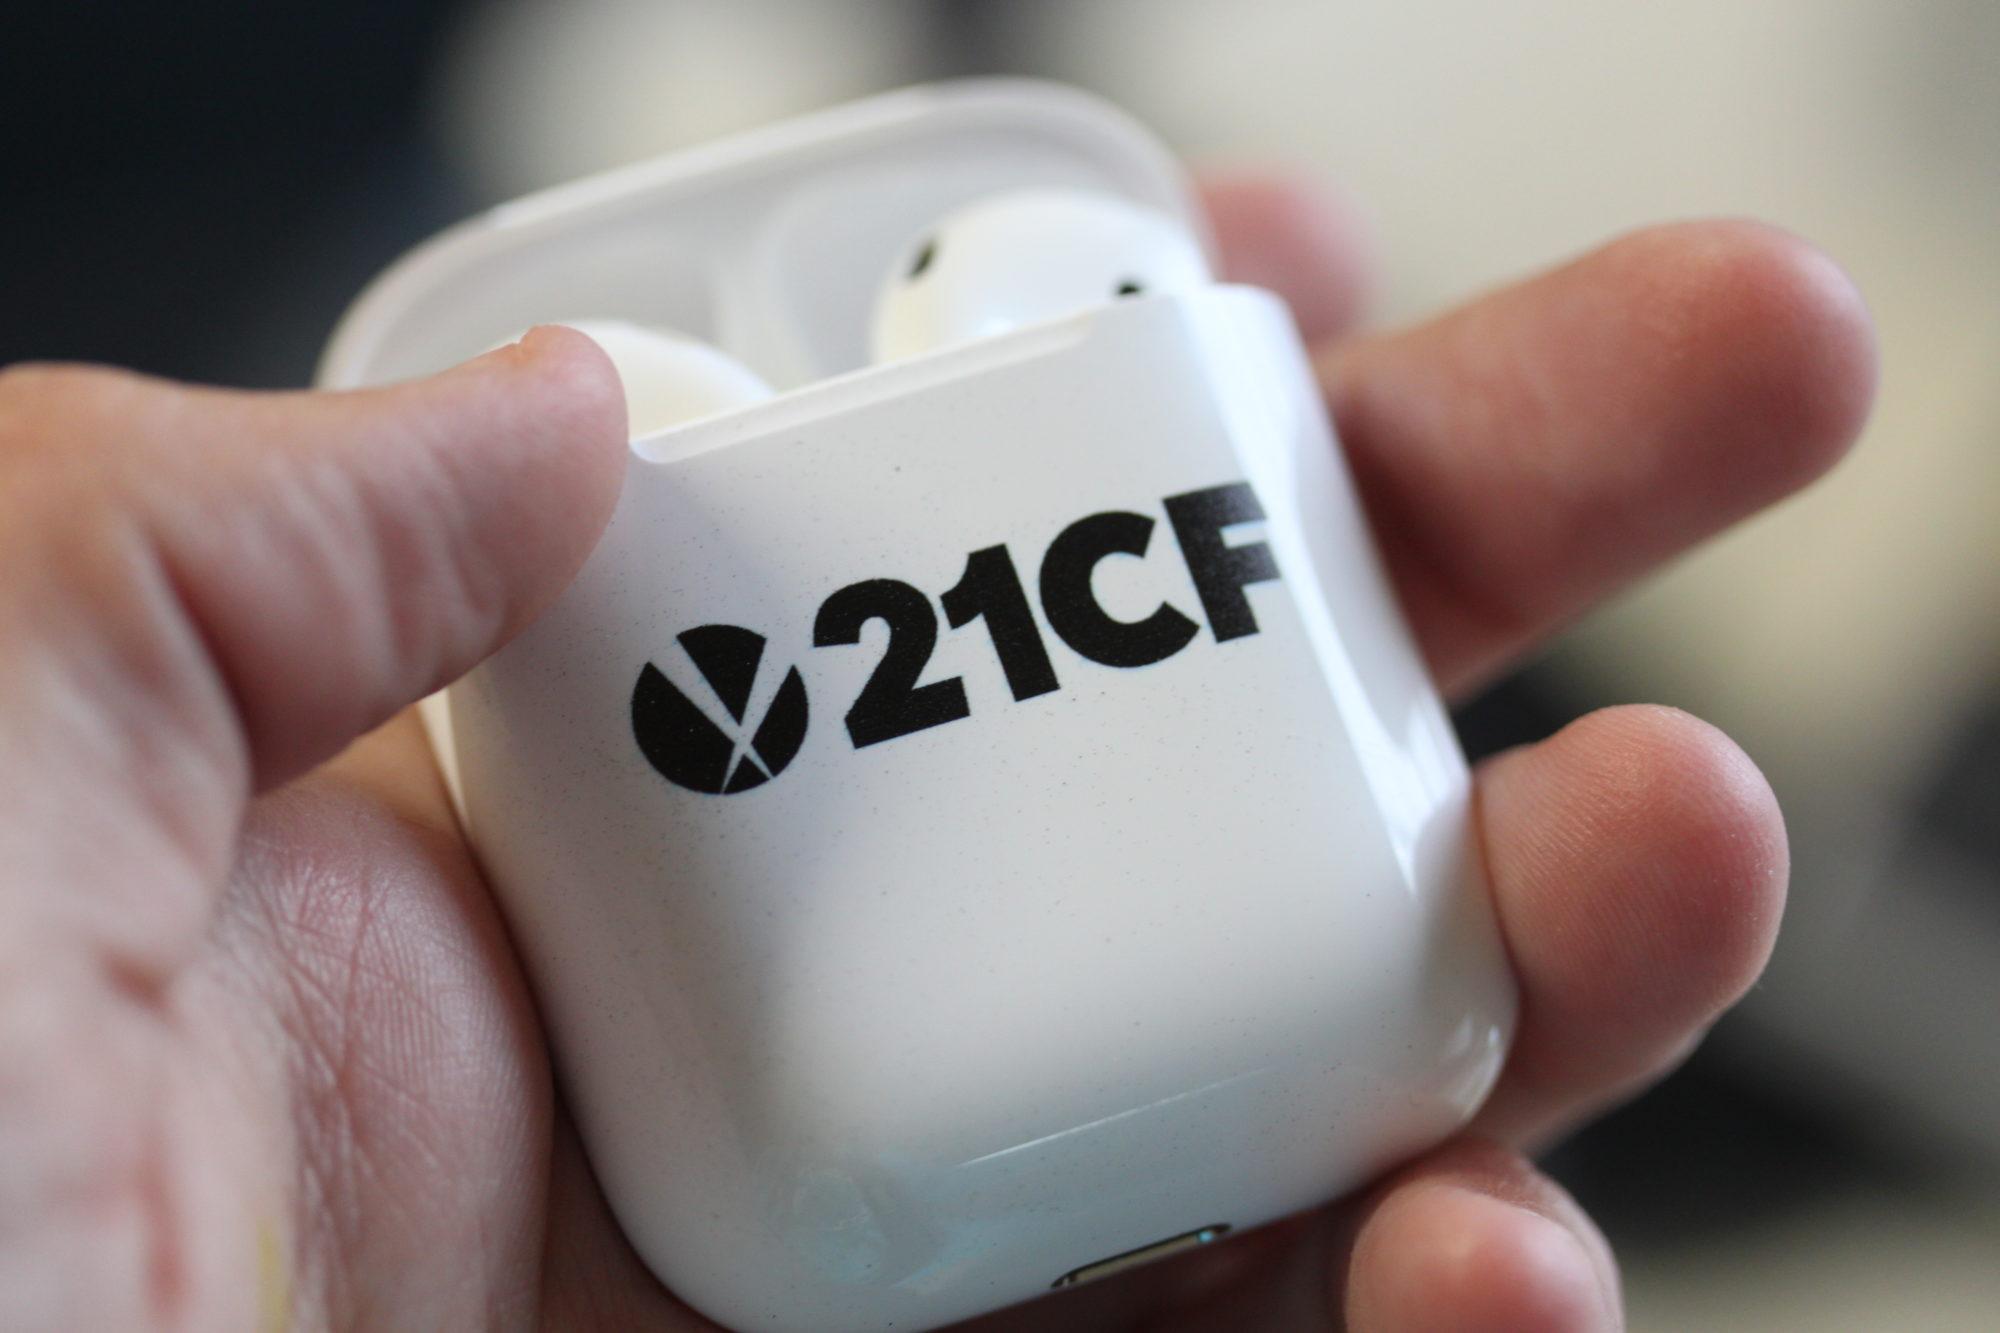 Custom Branded Apple Air Pods as Promos!